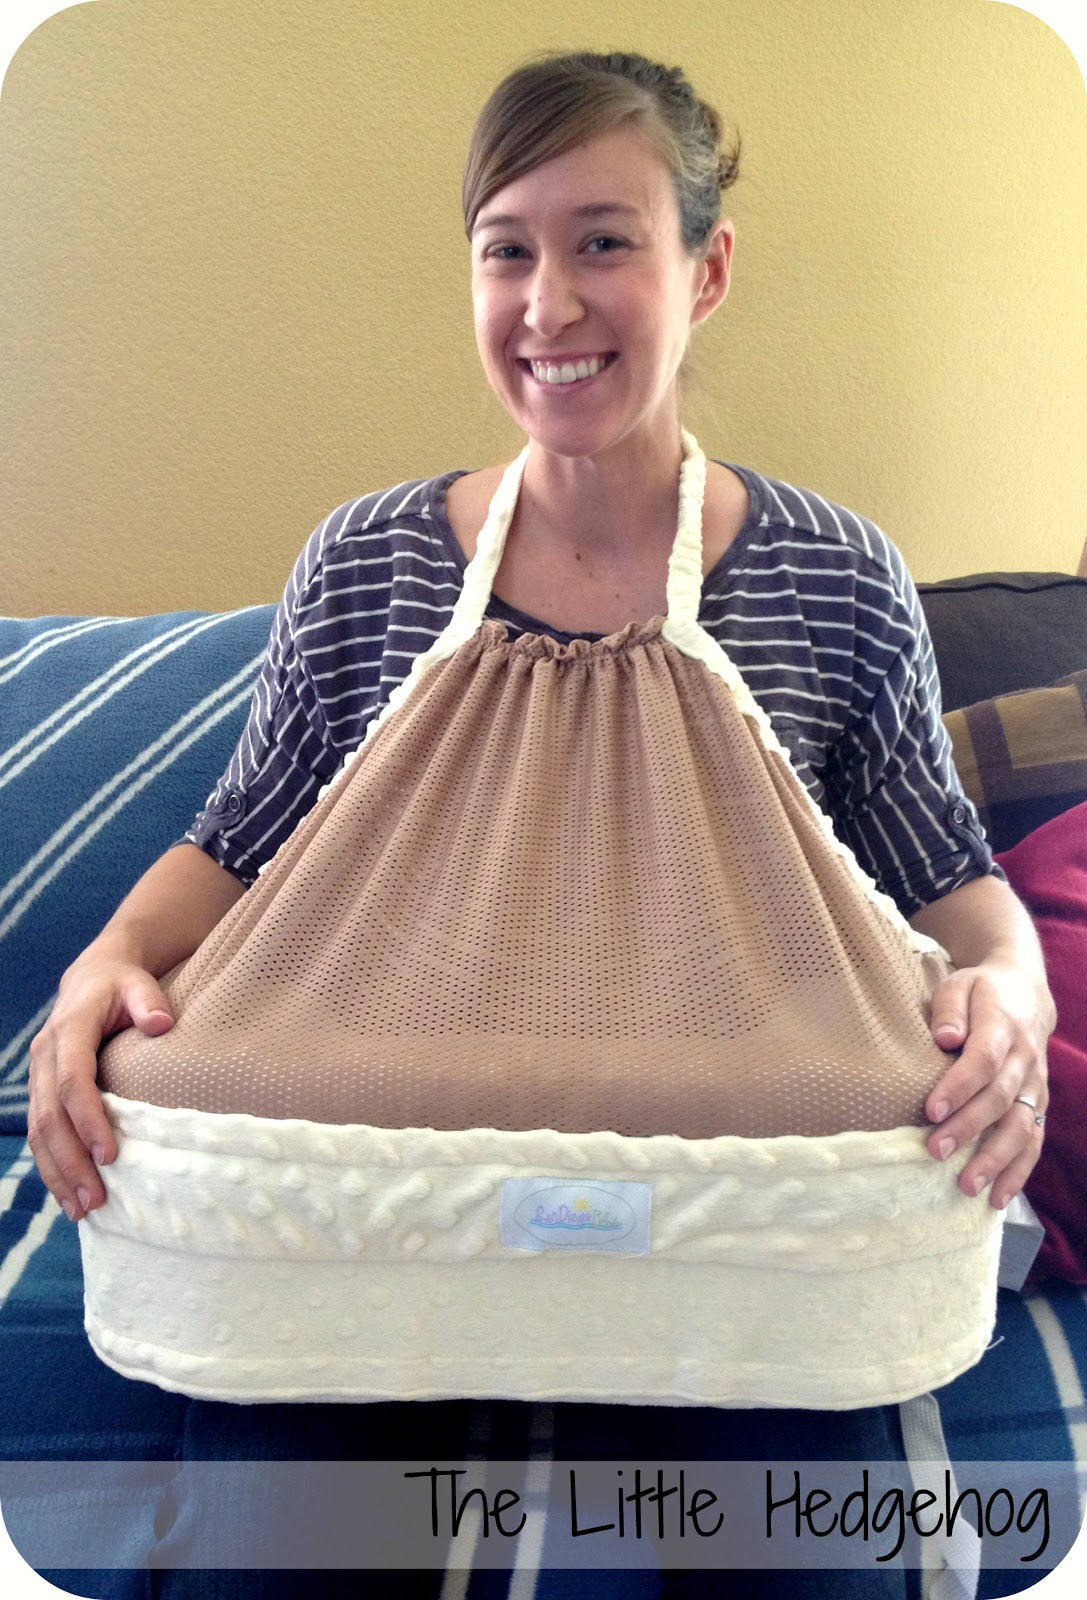 The Little Hedgehog Bumps To Babies San Diego Bebe Eco Nursing